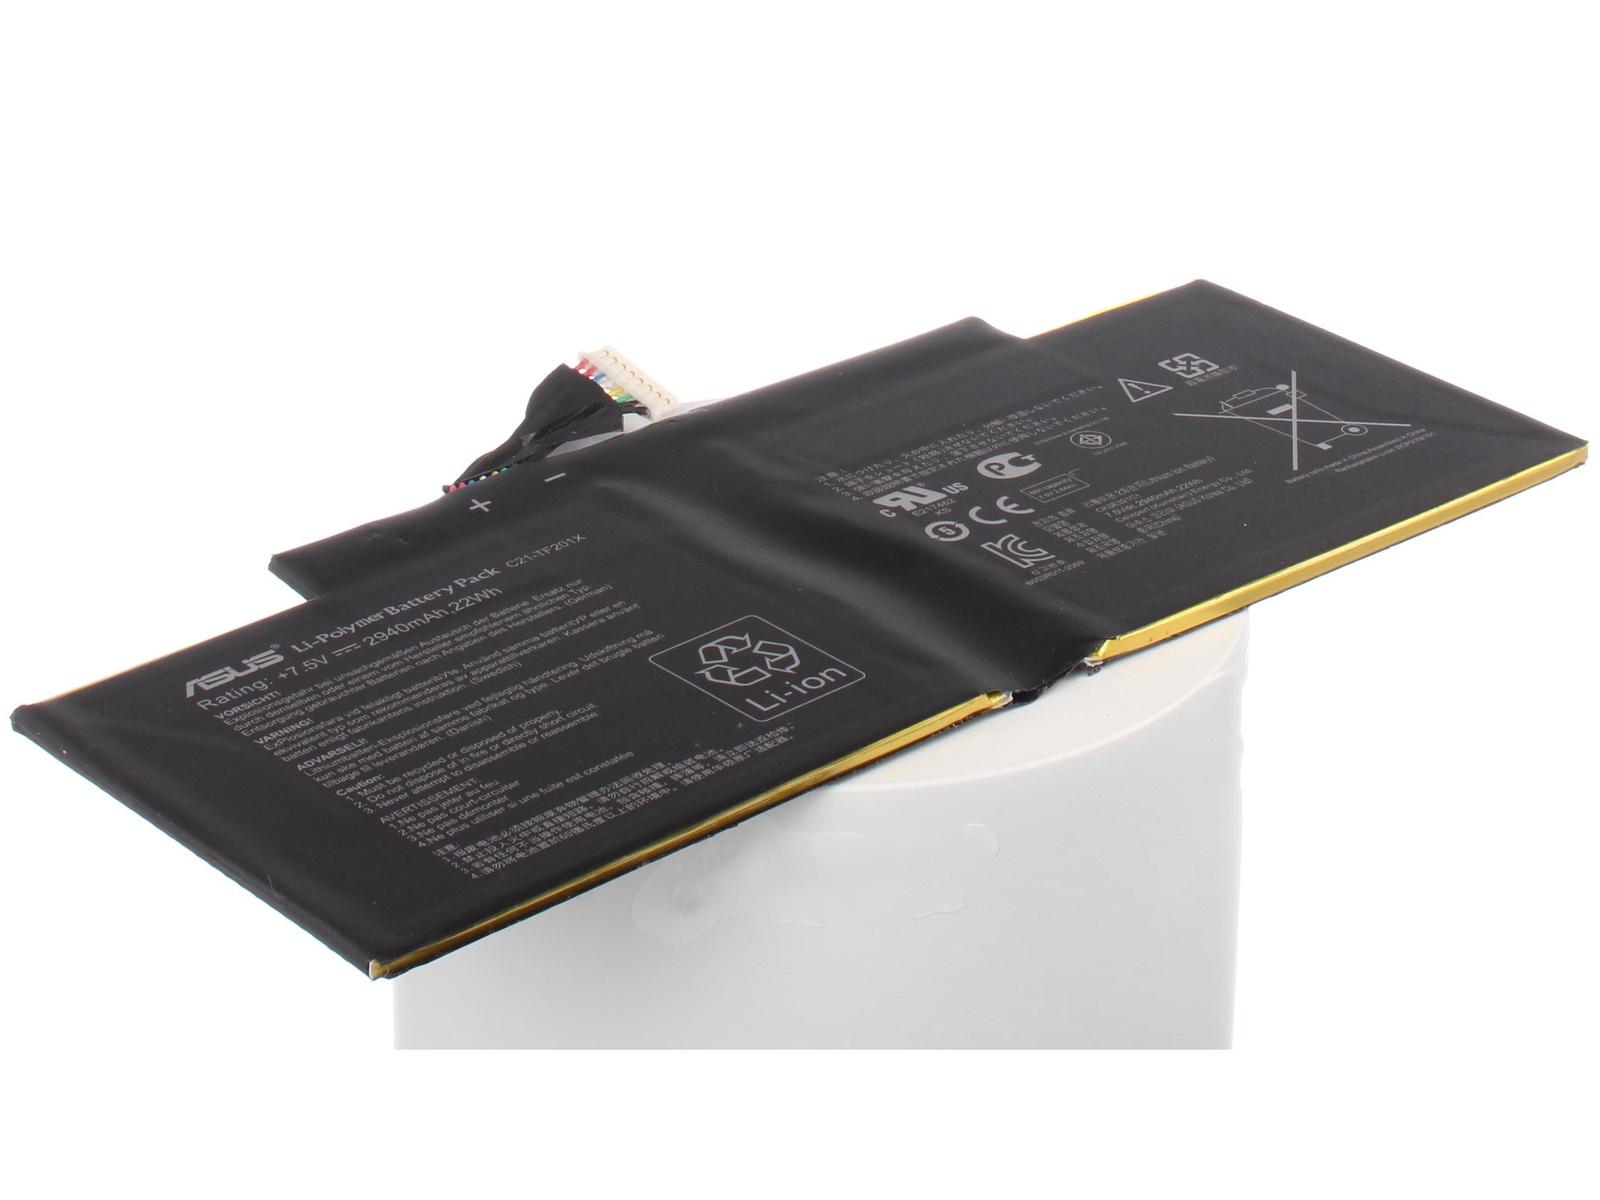 Аккумуляторная батарея iBatt iB-T2-A691 2900mAh для ноутбуков Asus